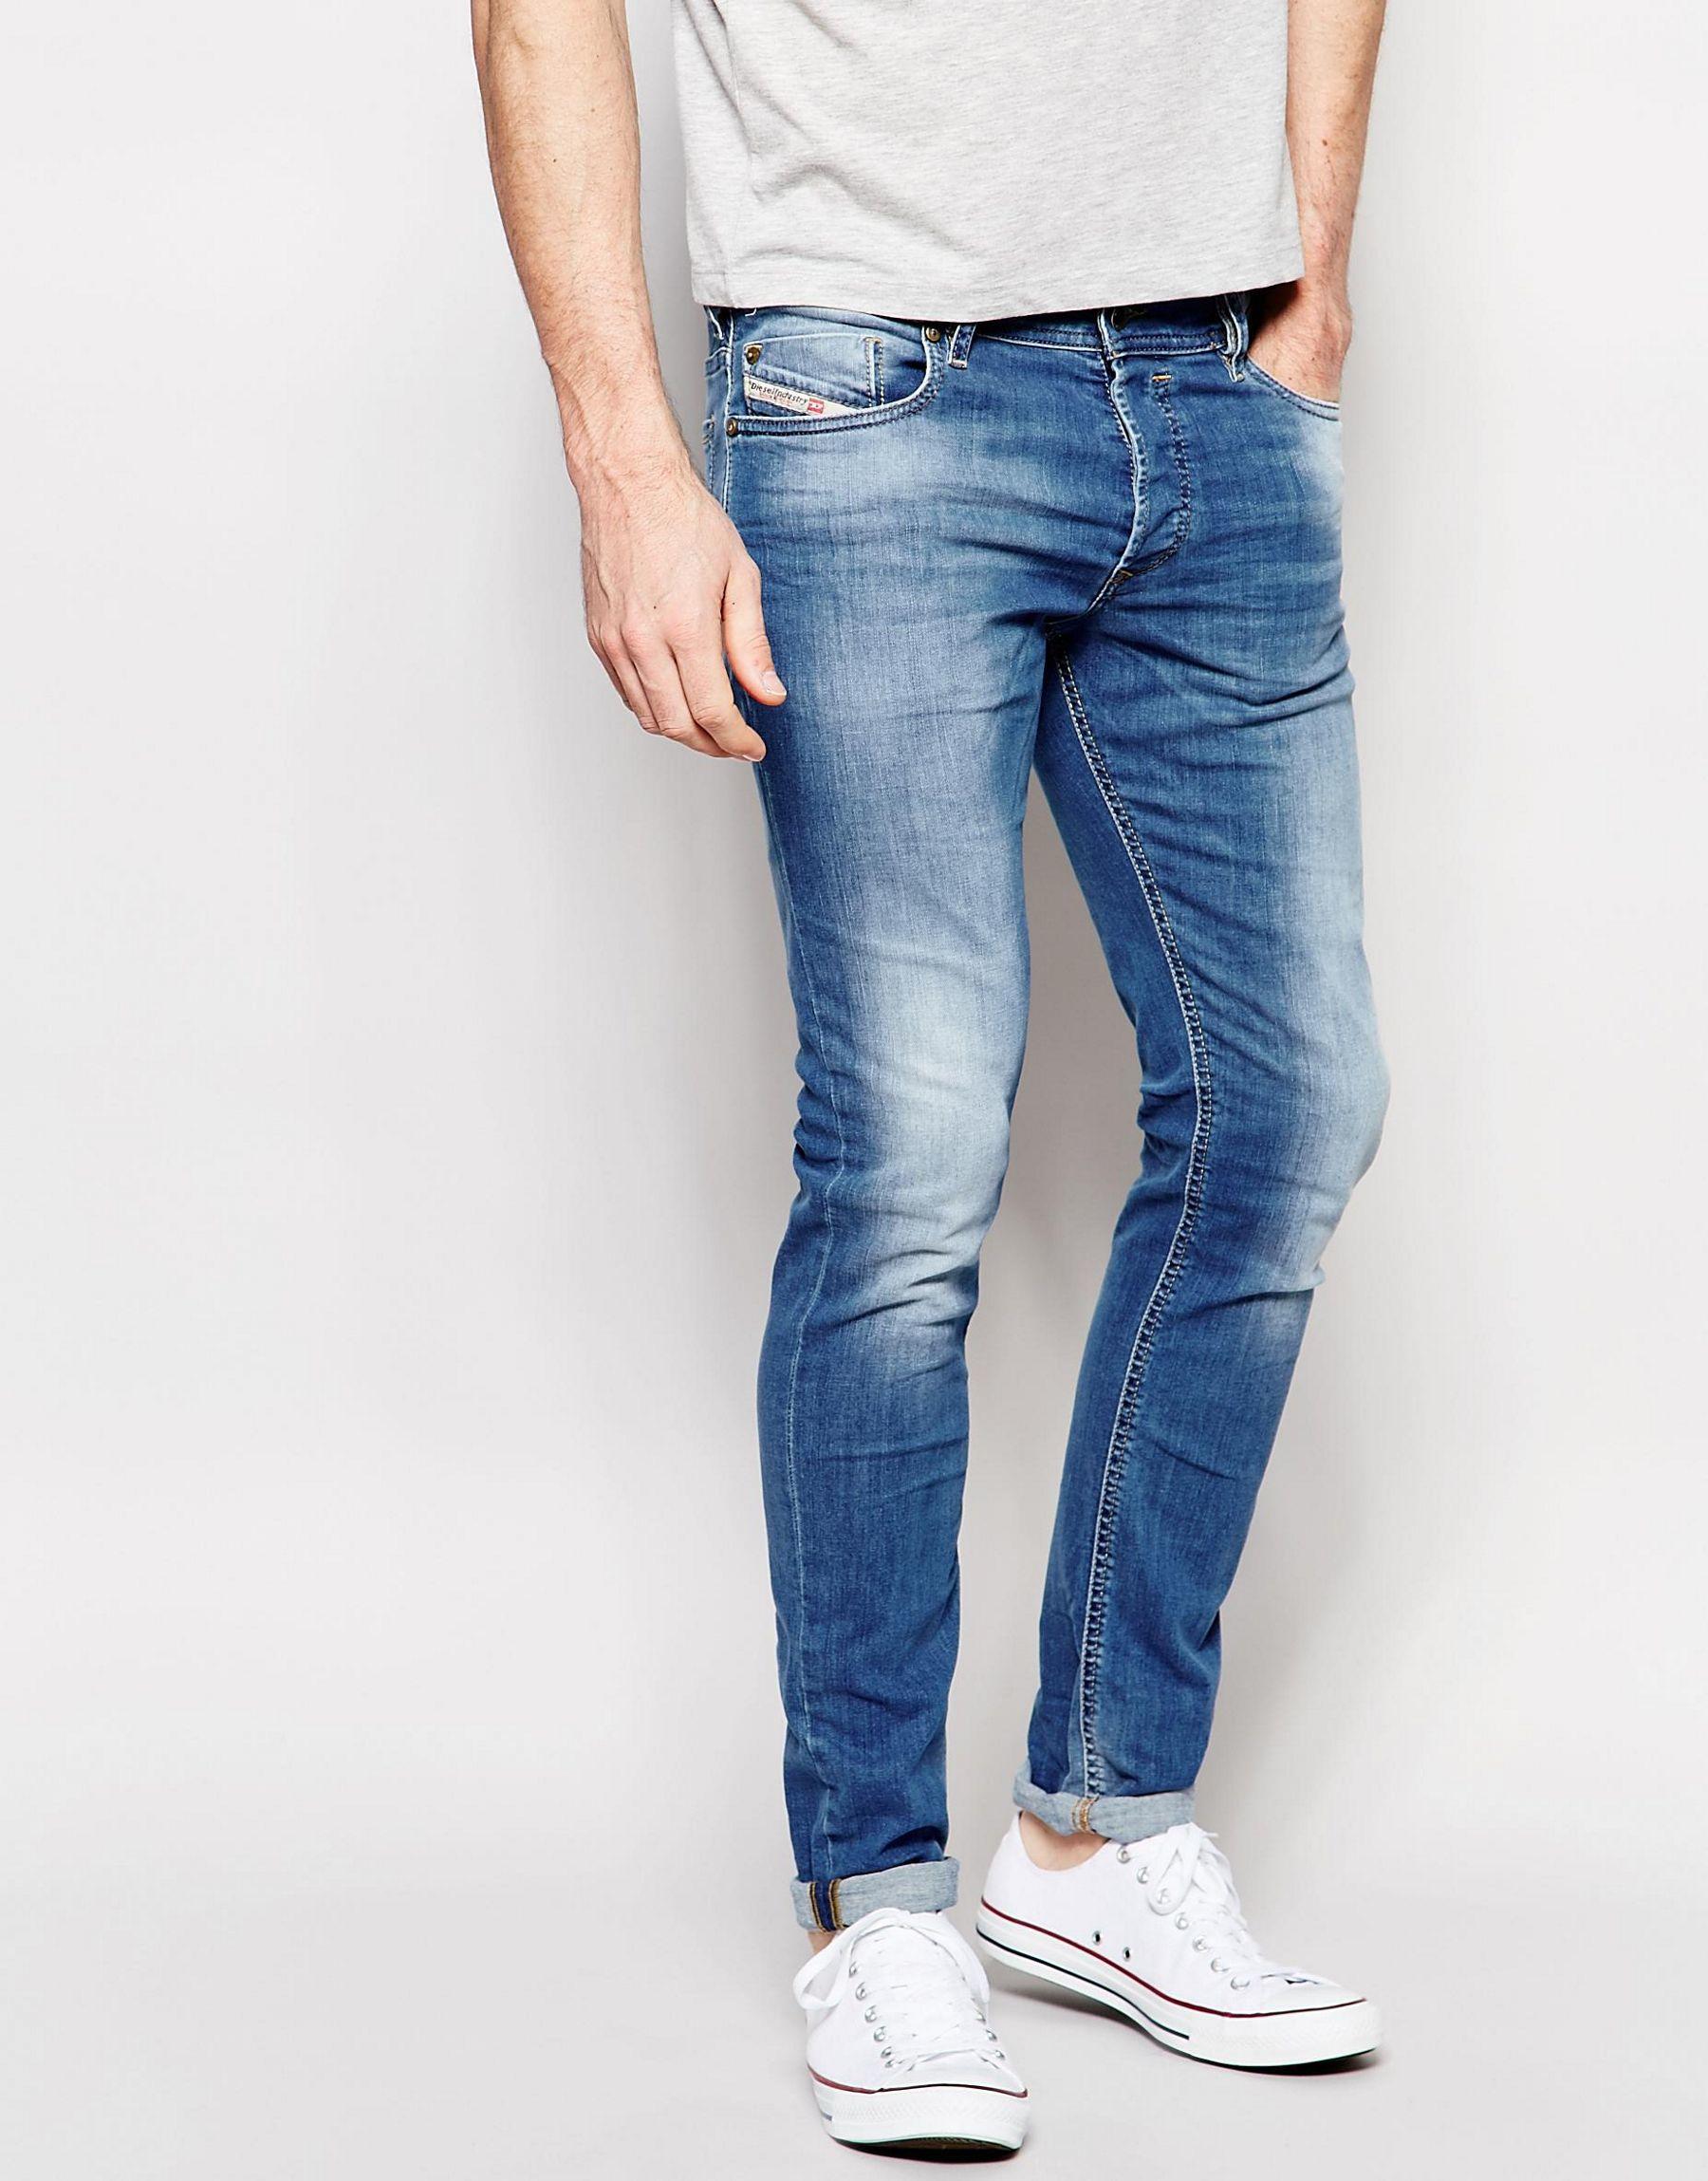 ca82cb3bef00e9 DIESEL Jeans Sleenker 607k Skinny Fit Stretch Light Distressed Wash ...